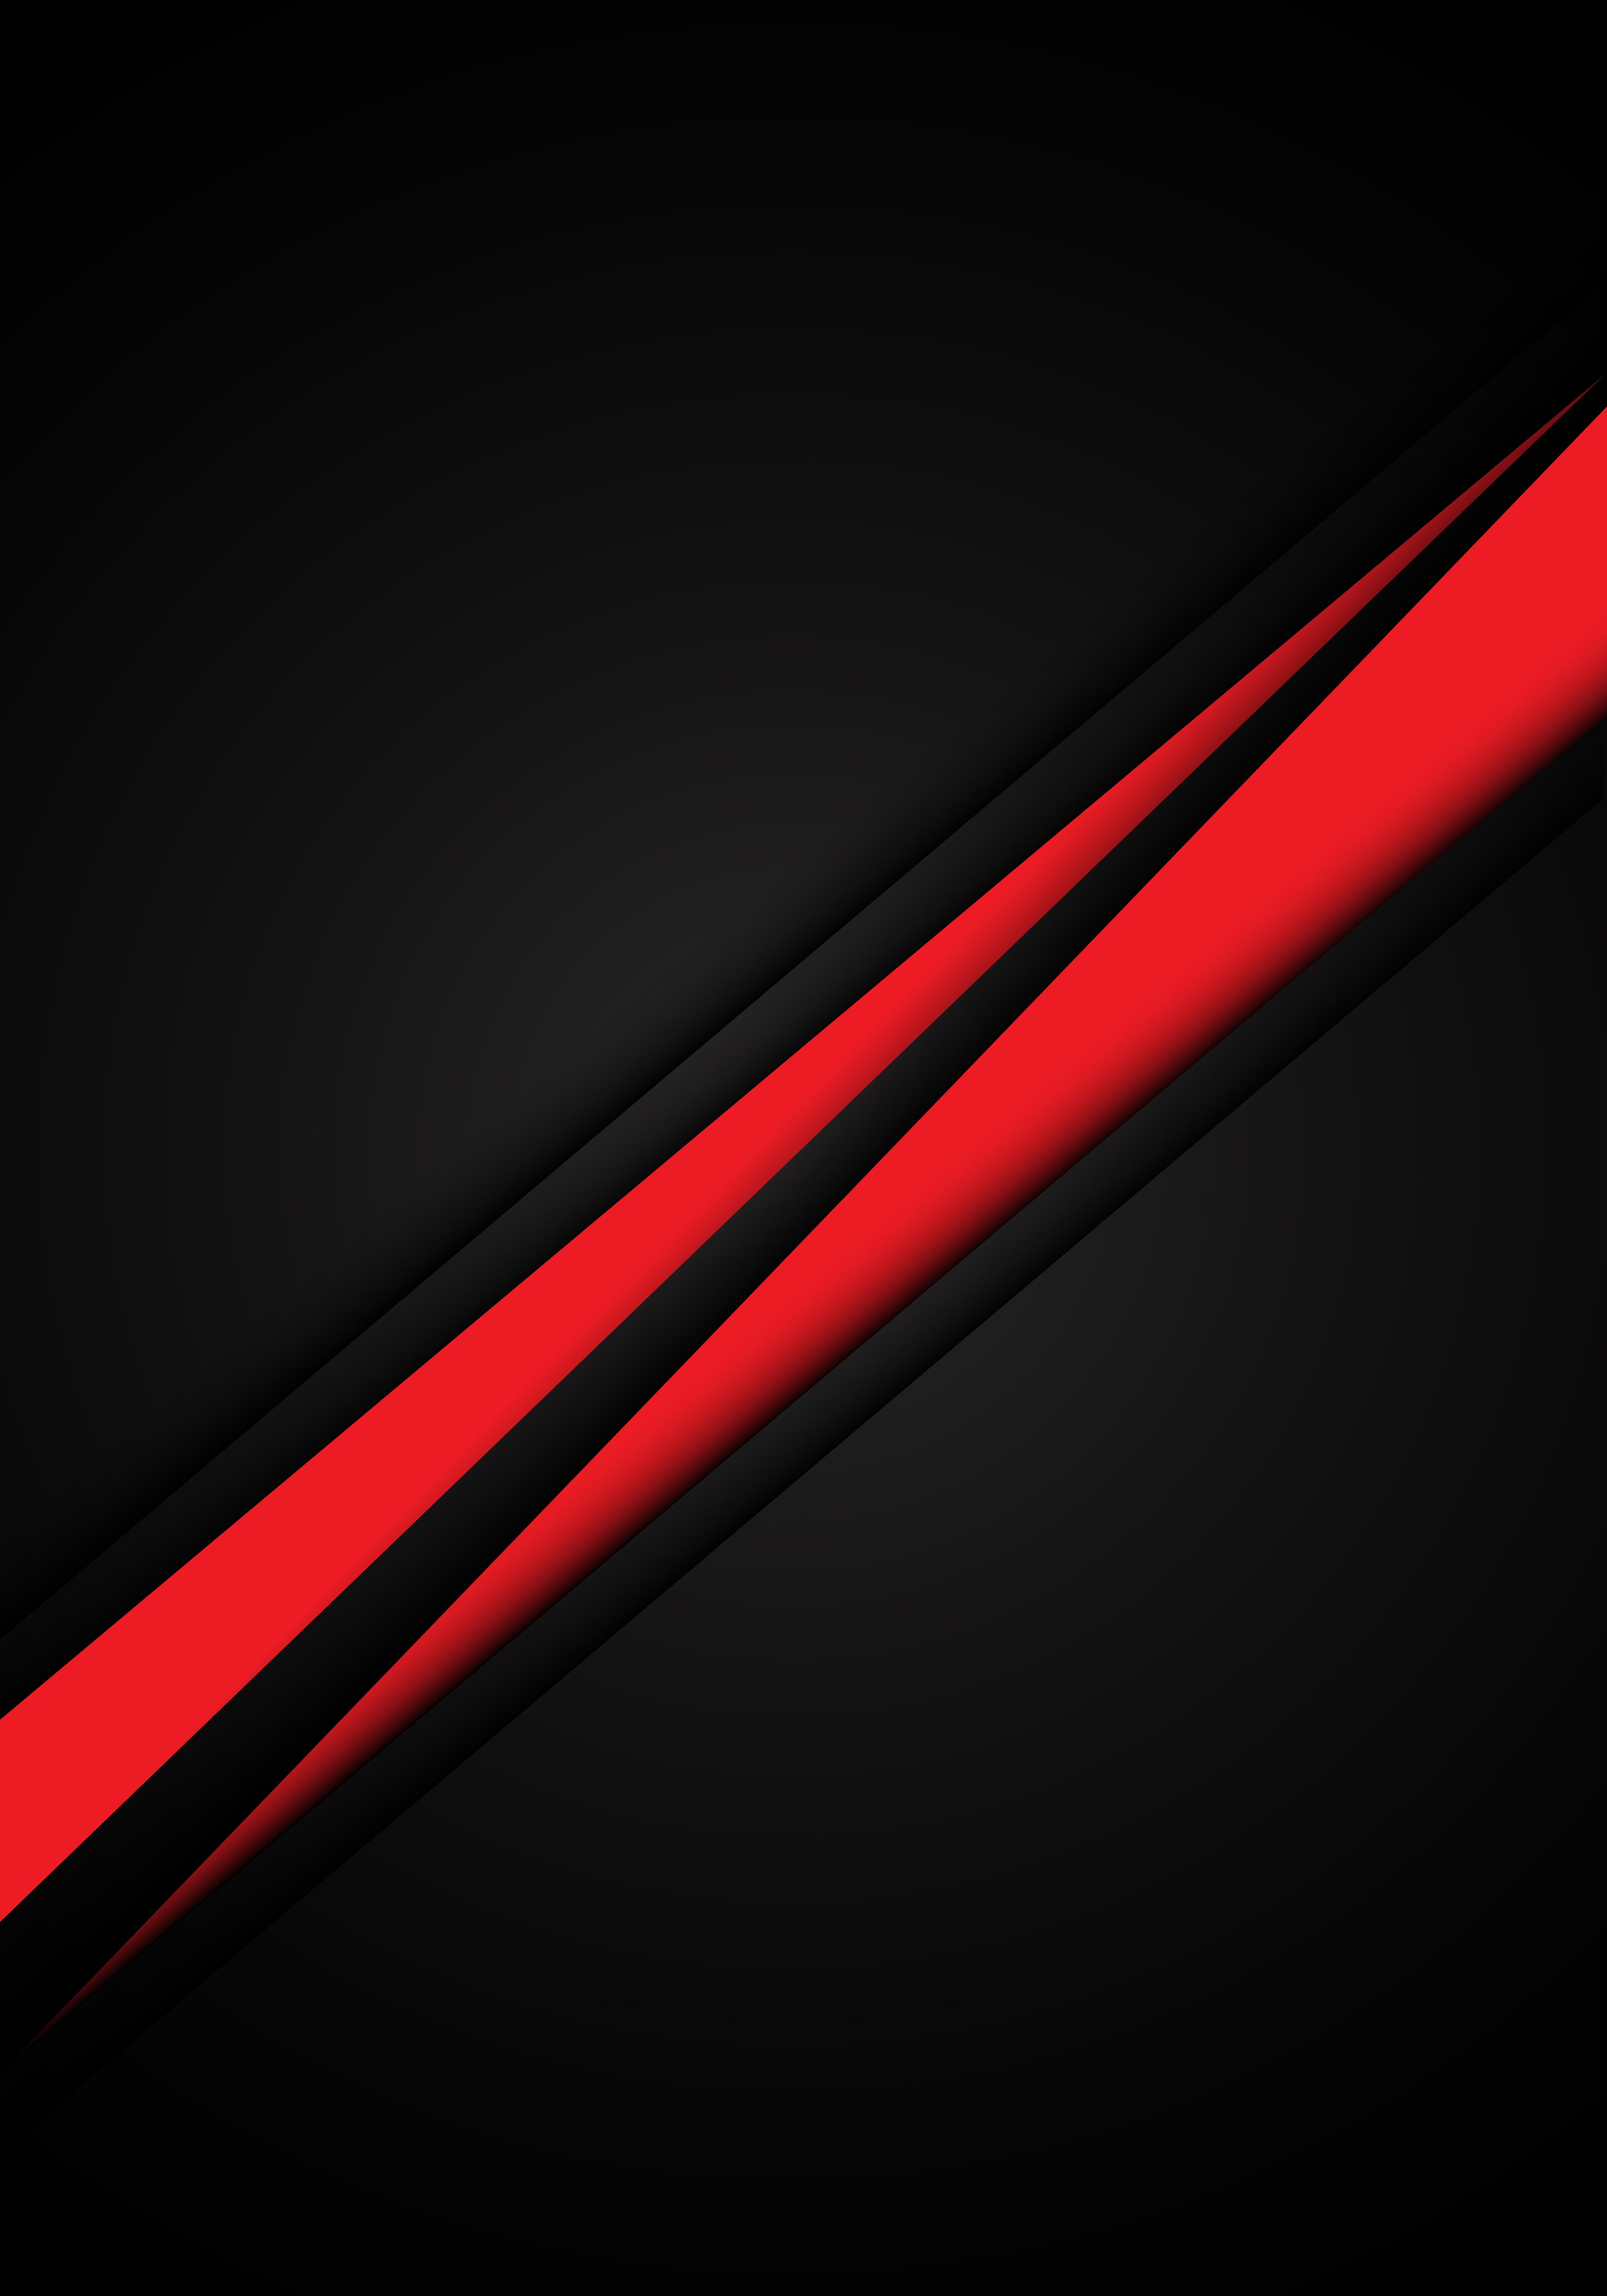 Red Black Background Design Abstract Geometry Ultrahd 4k Hd Phone Wallpaper Geometric Minima Red And Black Background Black Background Design Abstract Geometry